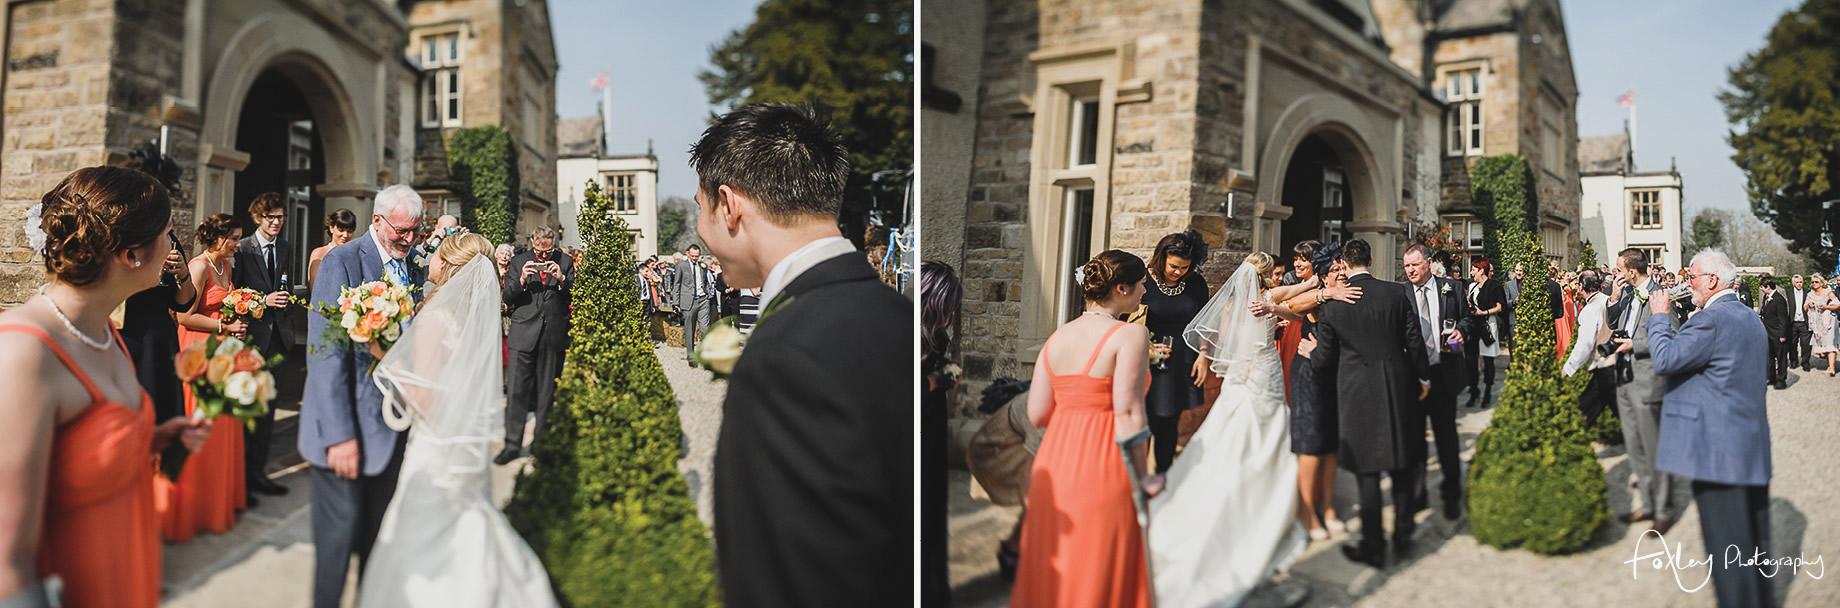 Gemma and Lewis' Wedding at Mitton Hall 096